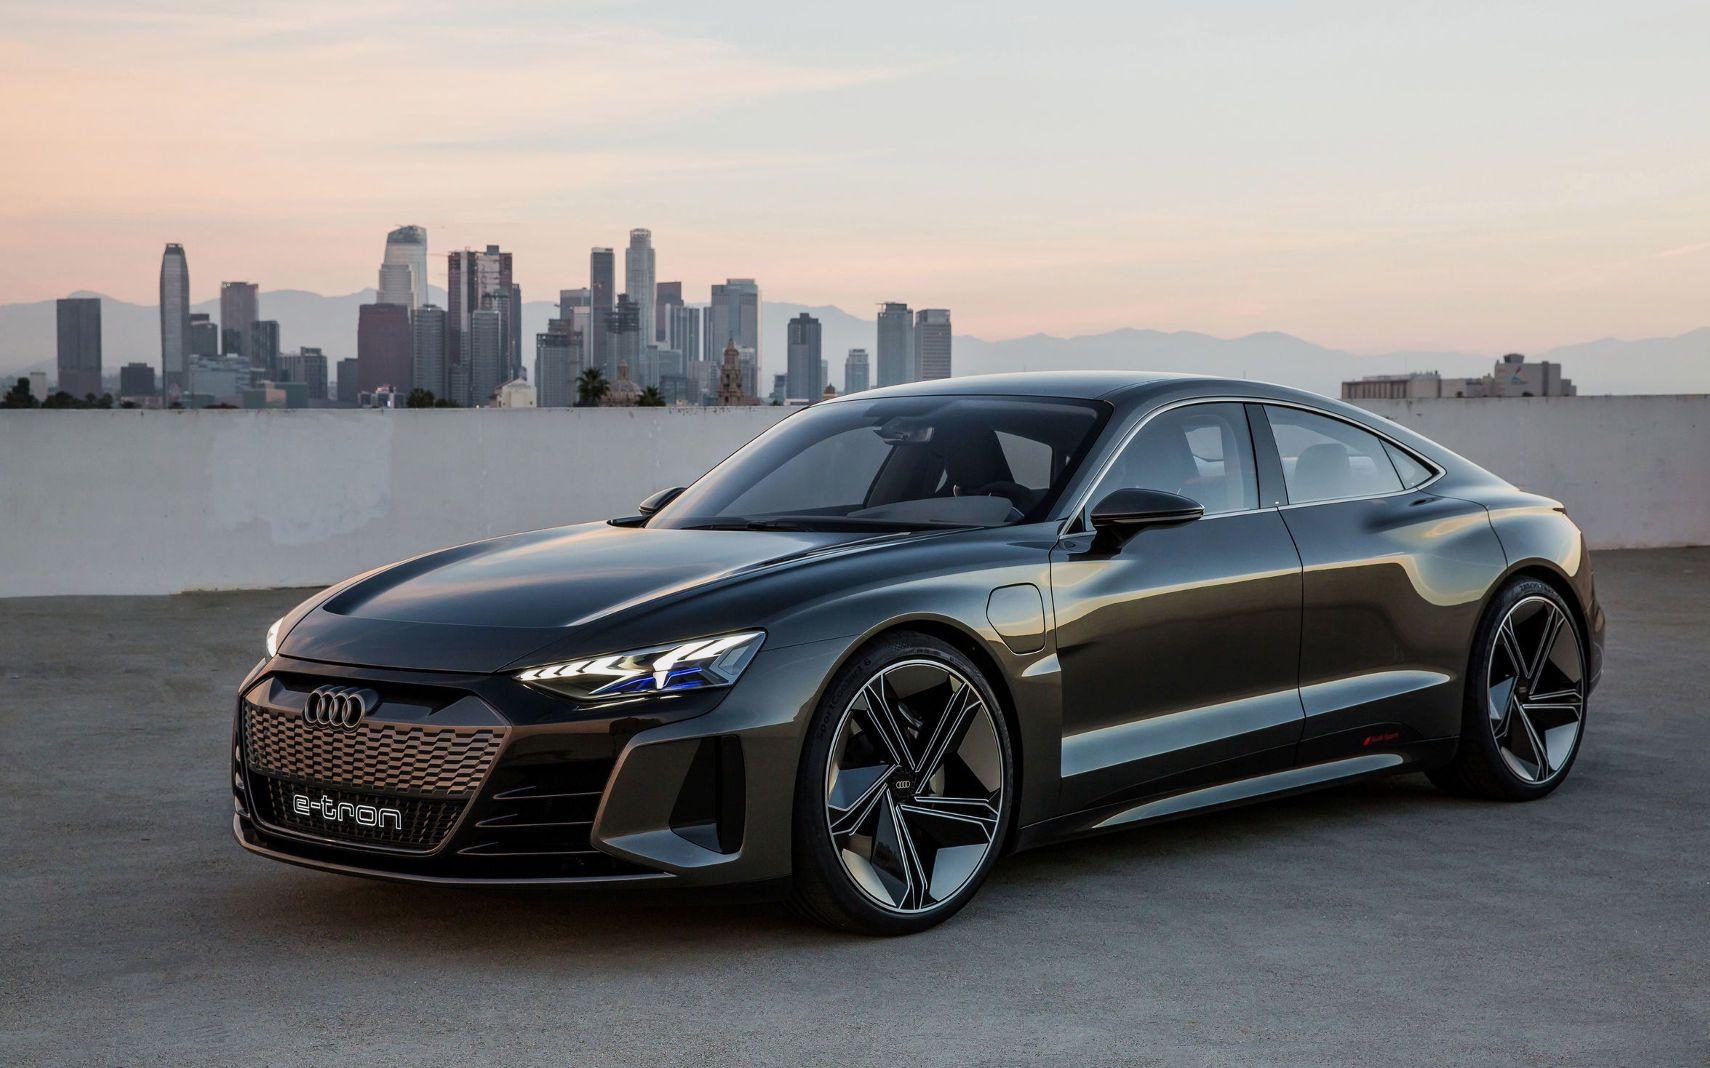 2020 Audi E Tron Gran Turismo Improb Audi E Tron Audi Luxury Cars